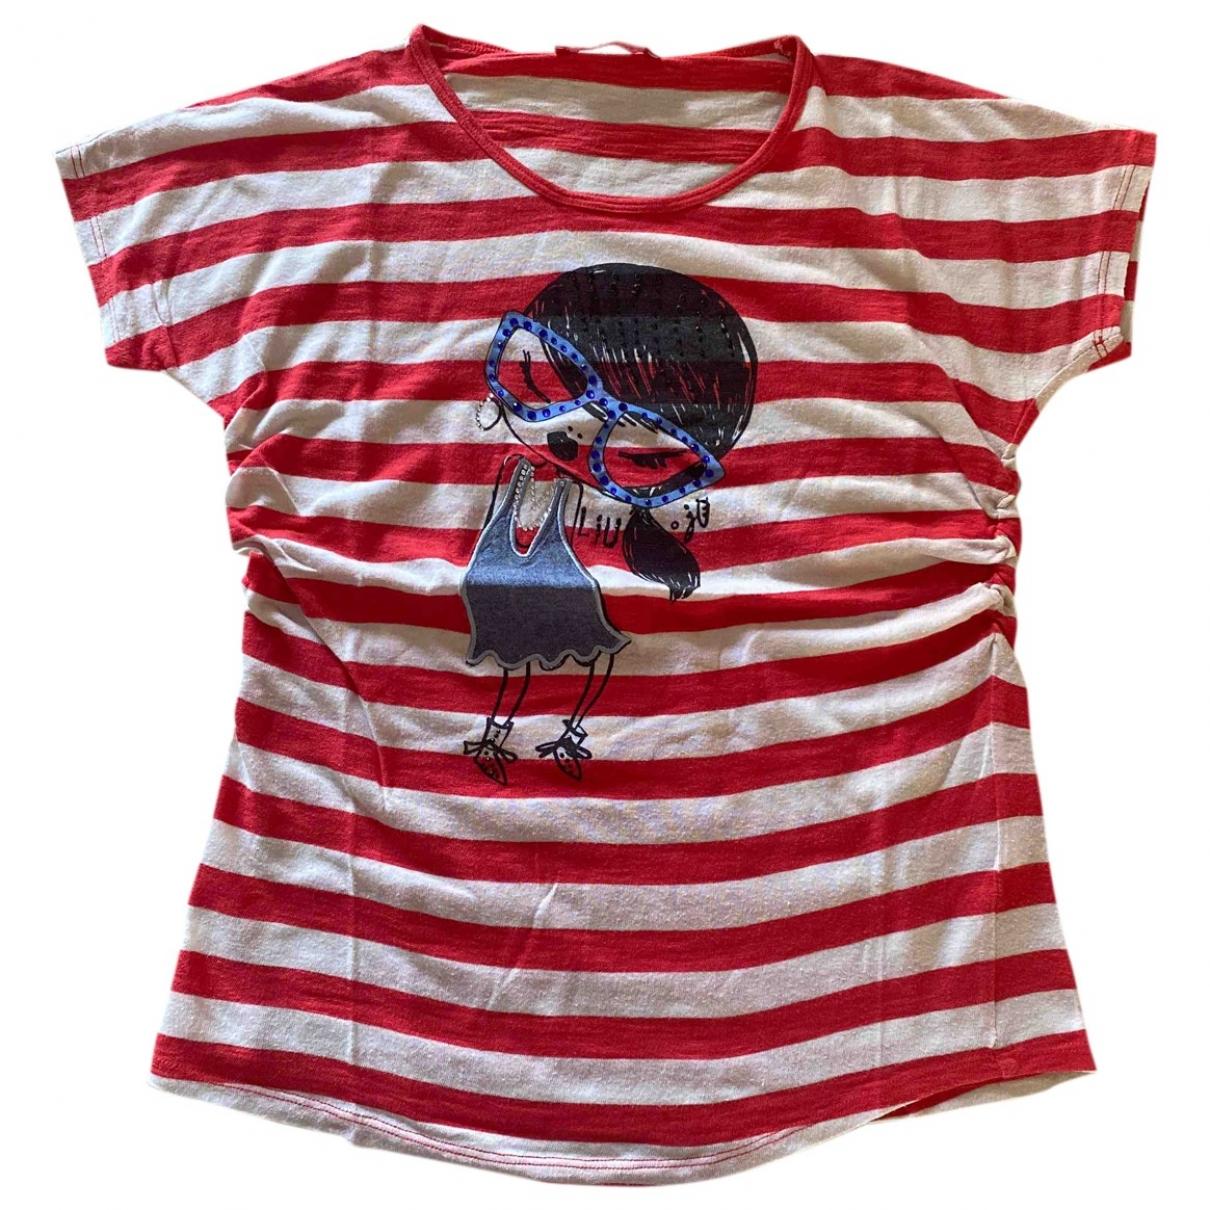 Camiseta Liu.jo